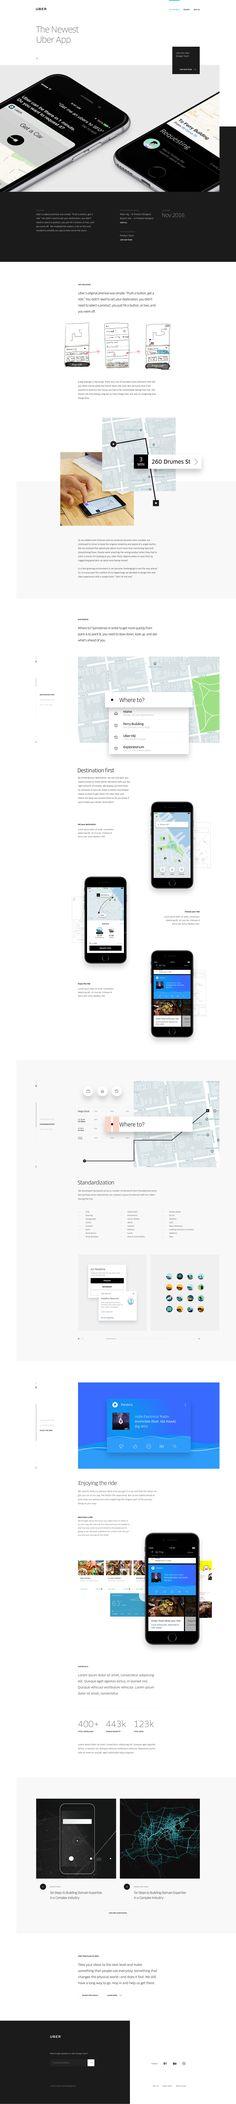 UBER design case study and UI design concept by UENO.